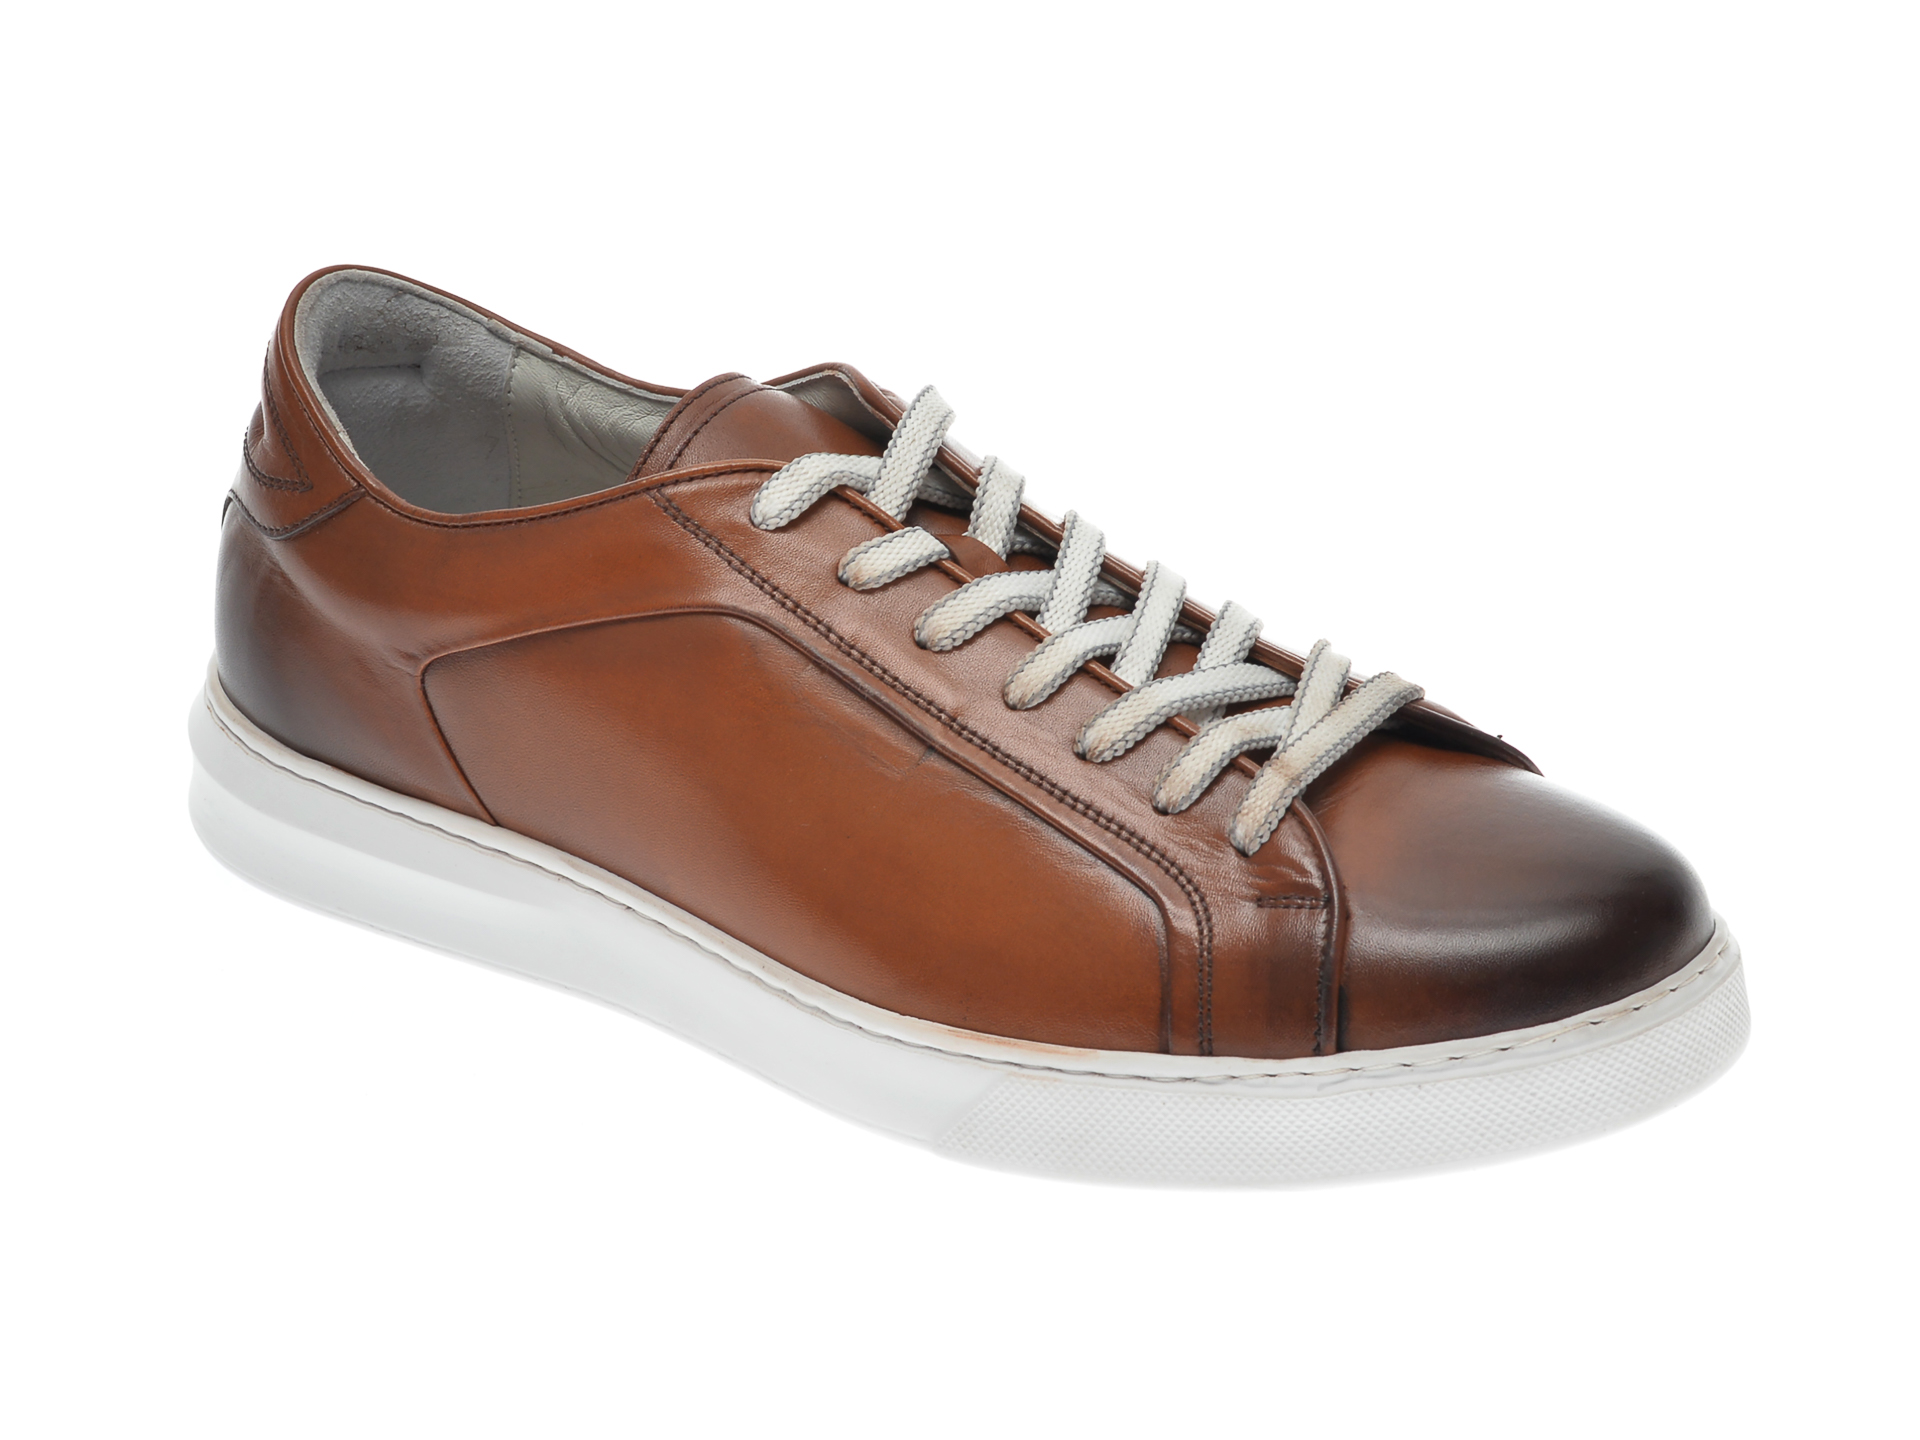 Pantofi OTTER maro, 3384, din piele naturala imagine